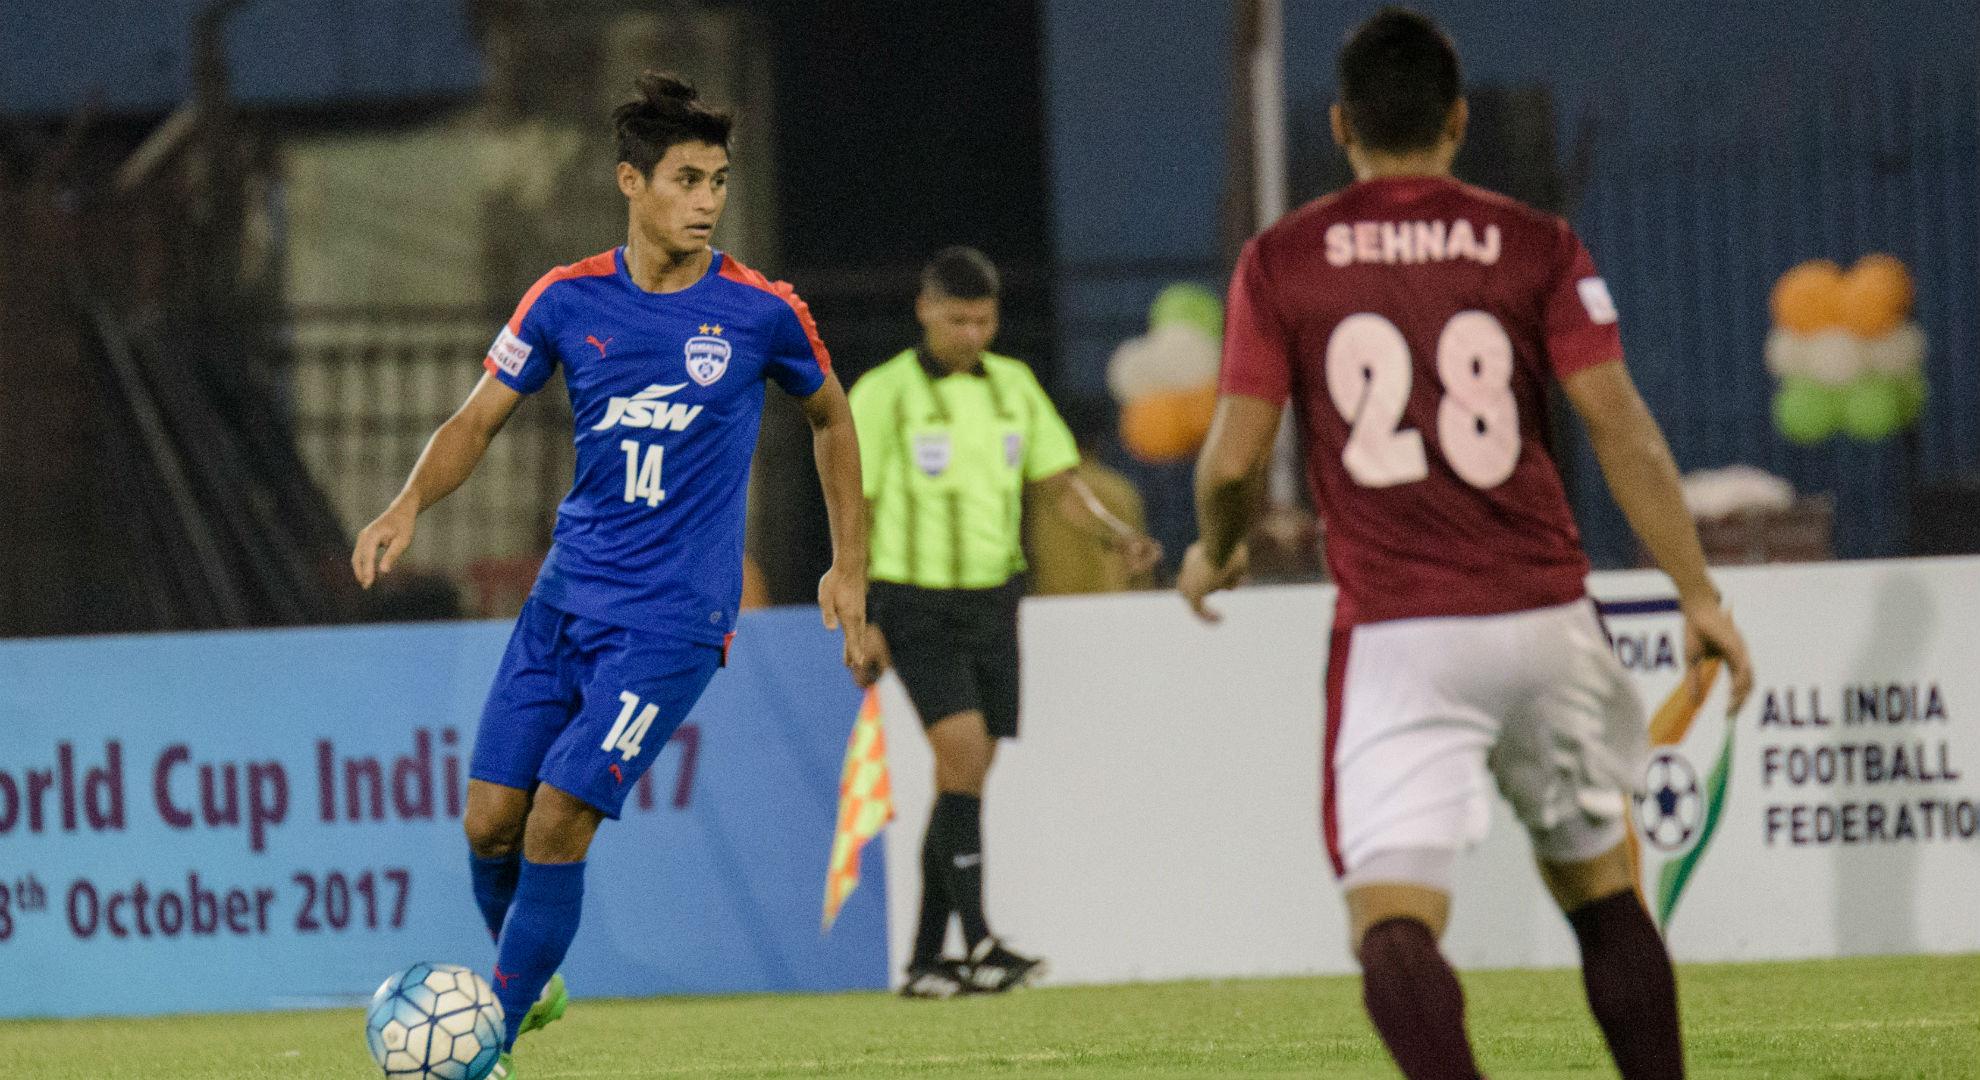 Eugeneson Lyngdoh Bengaluru FC Mohun Bagan Federation Cup Final 2017